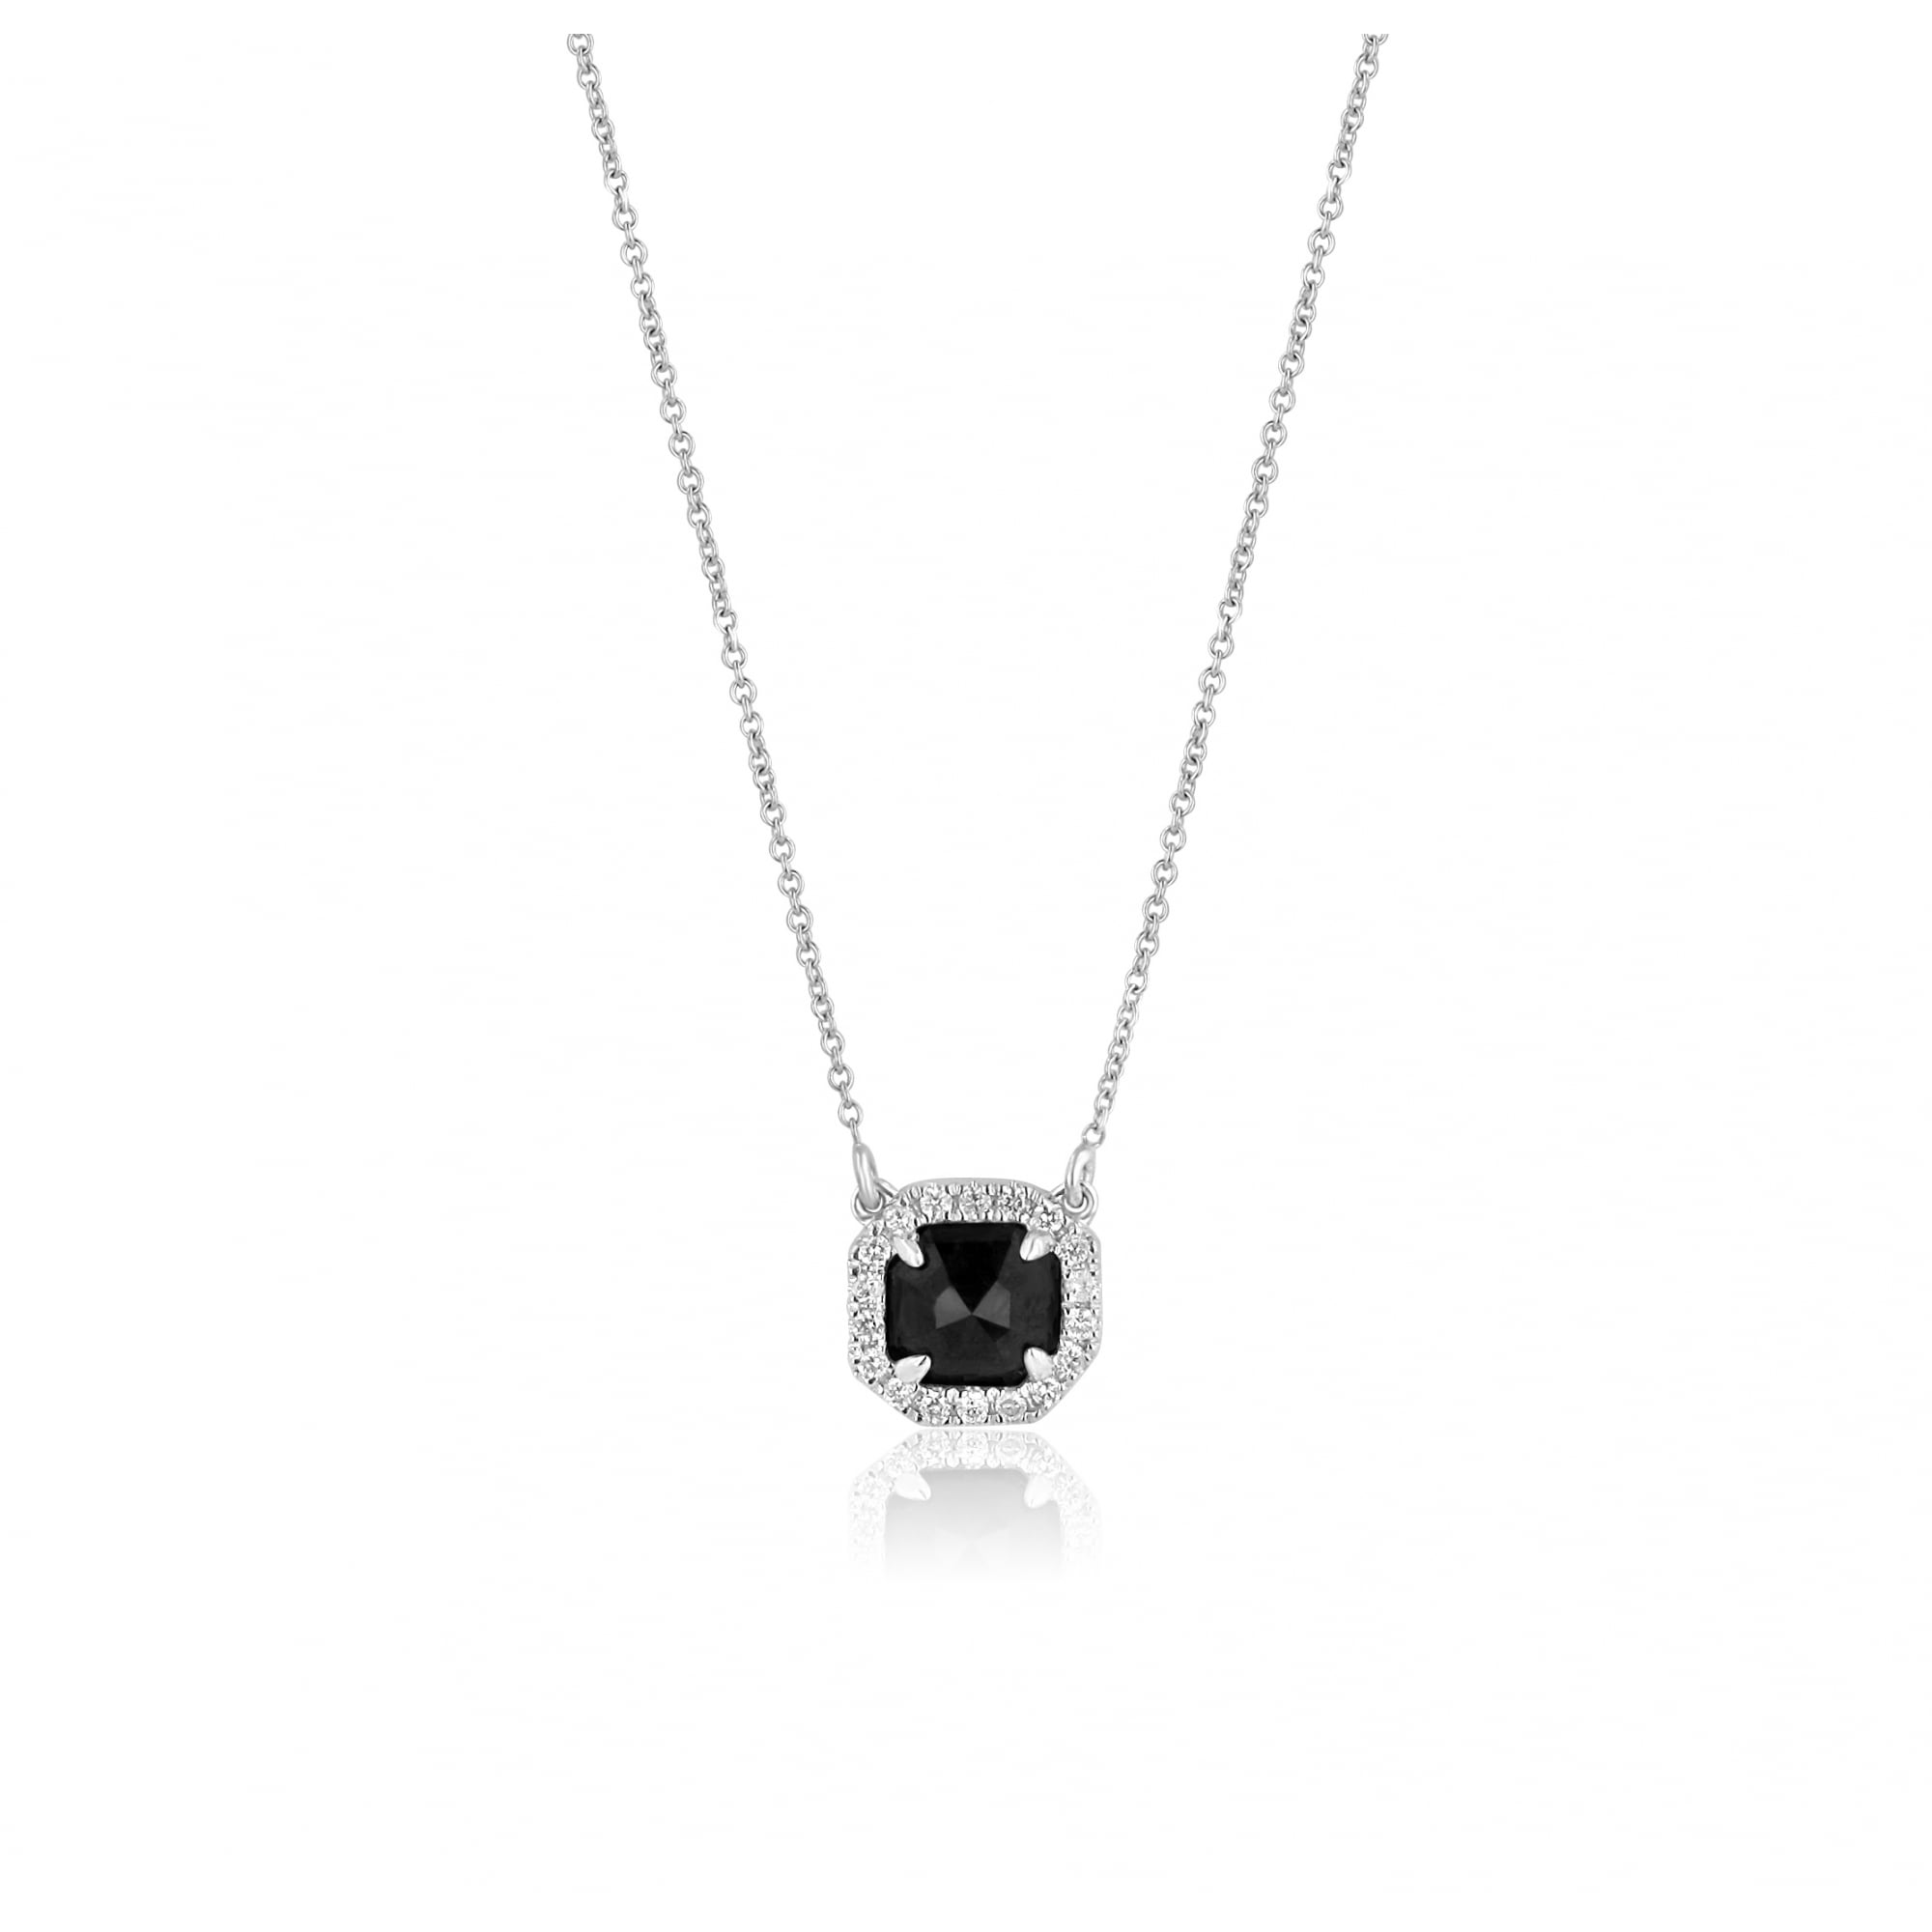 White and Black Diamond Pendant on White Gold Chain